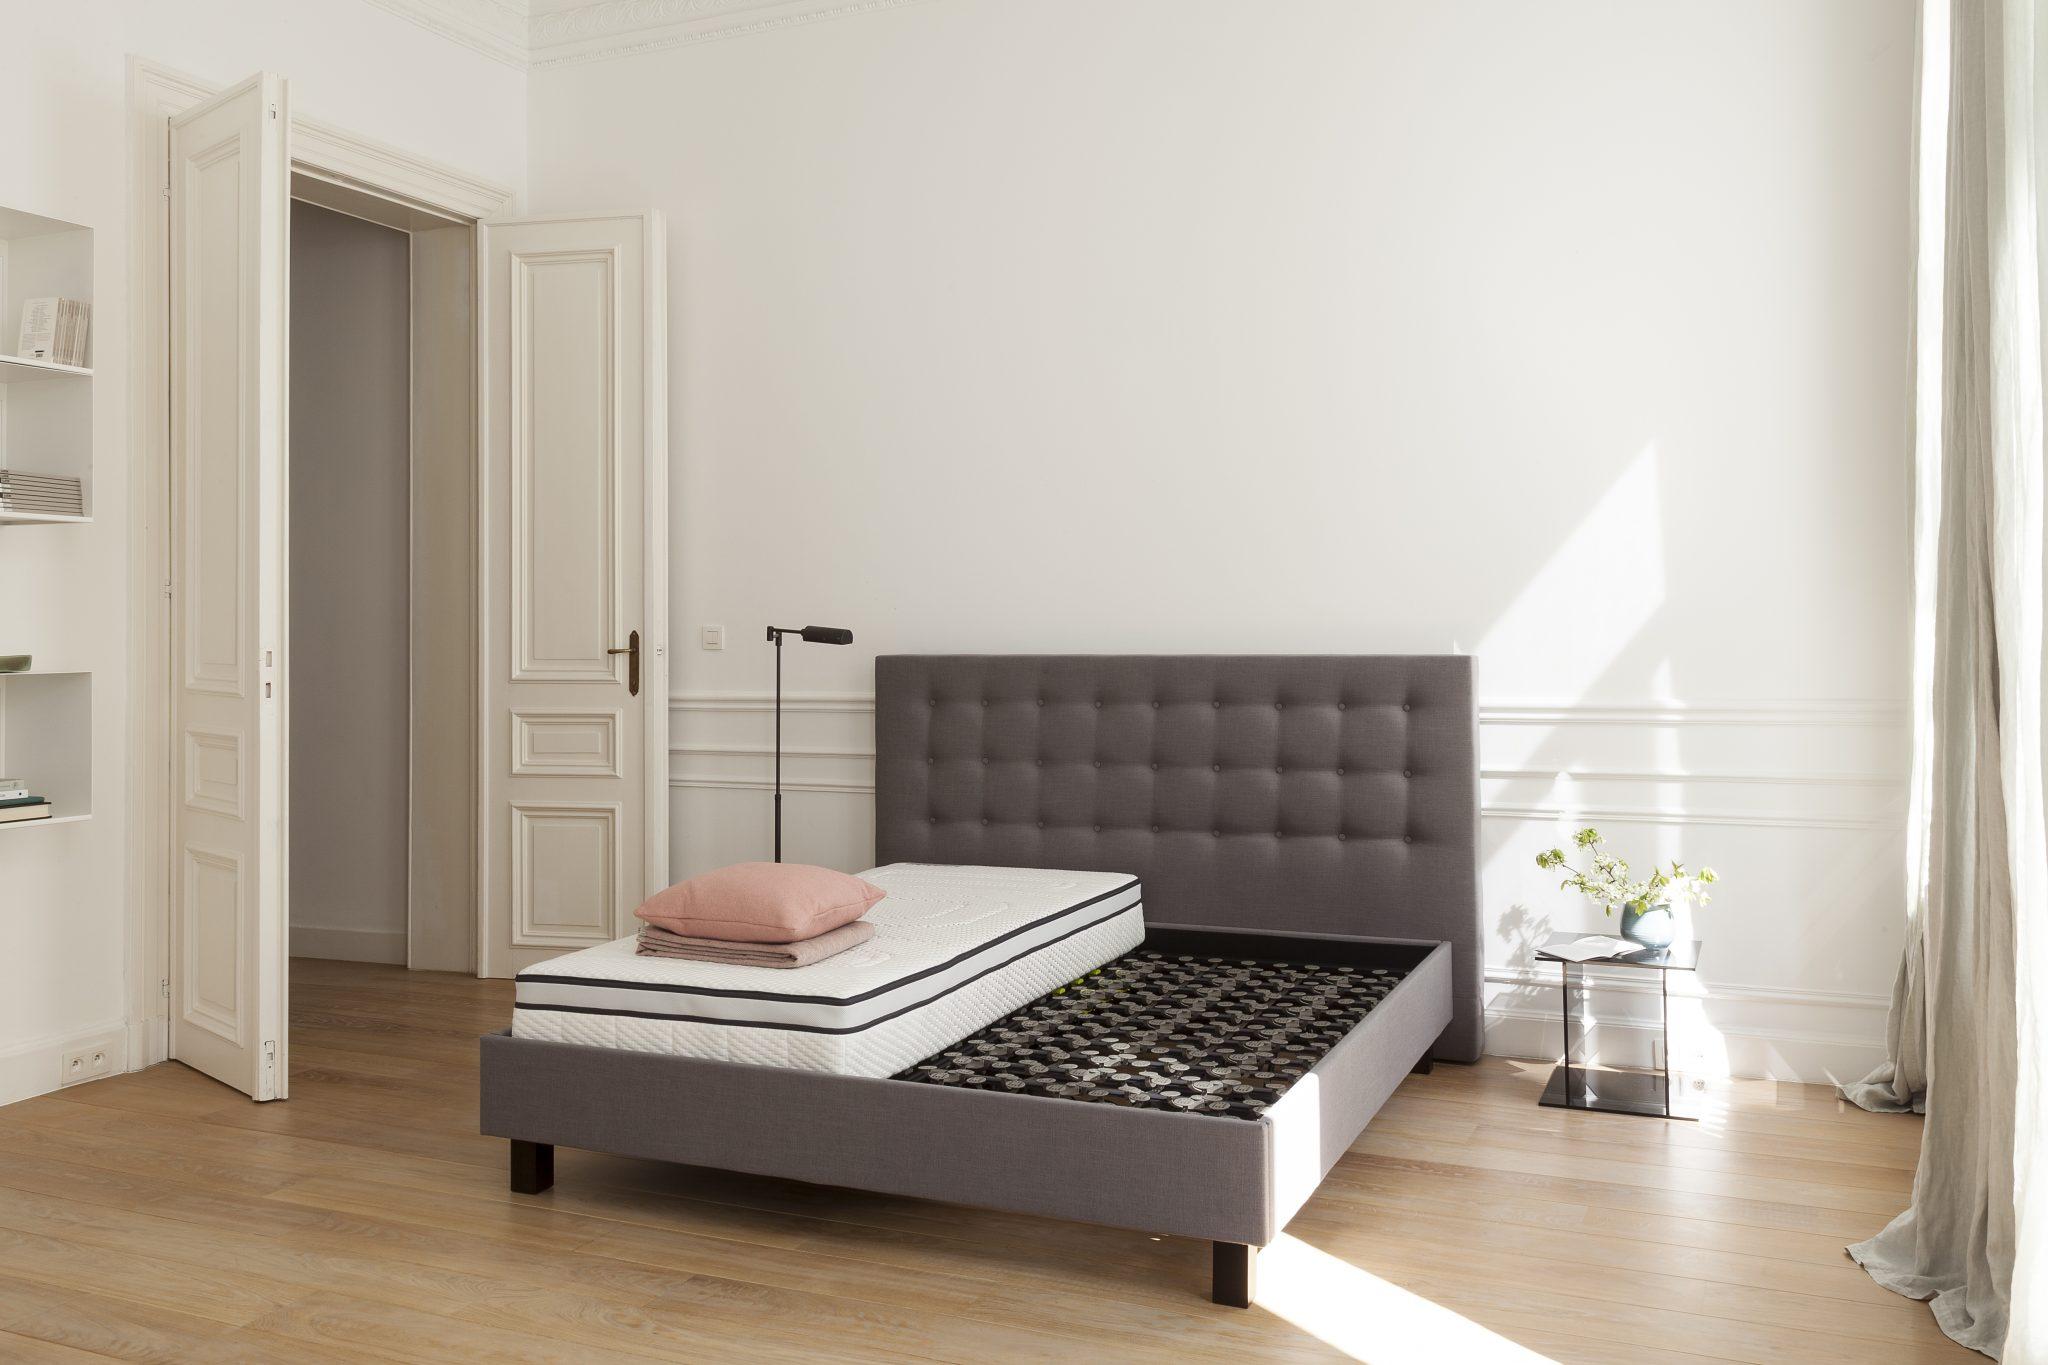 cadre de lit garni beka lattoflex au lit. Black Bedroom Furniture Sets. Home Design Ideas